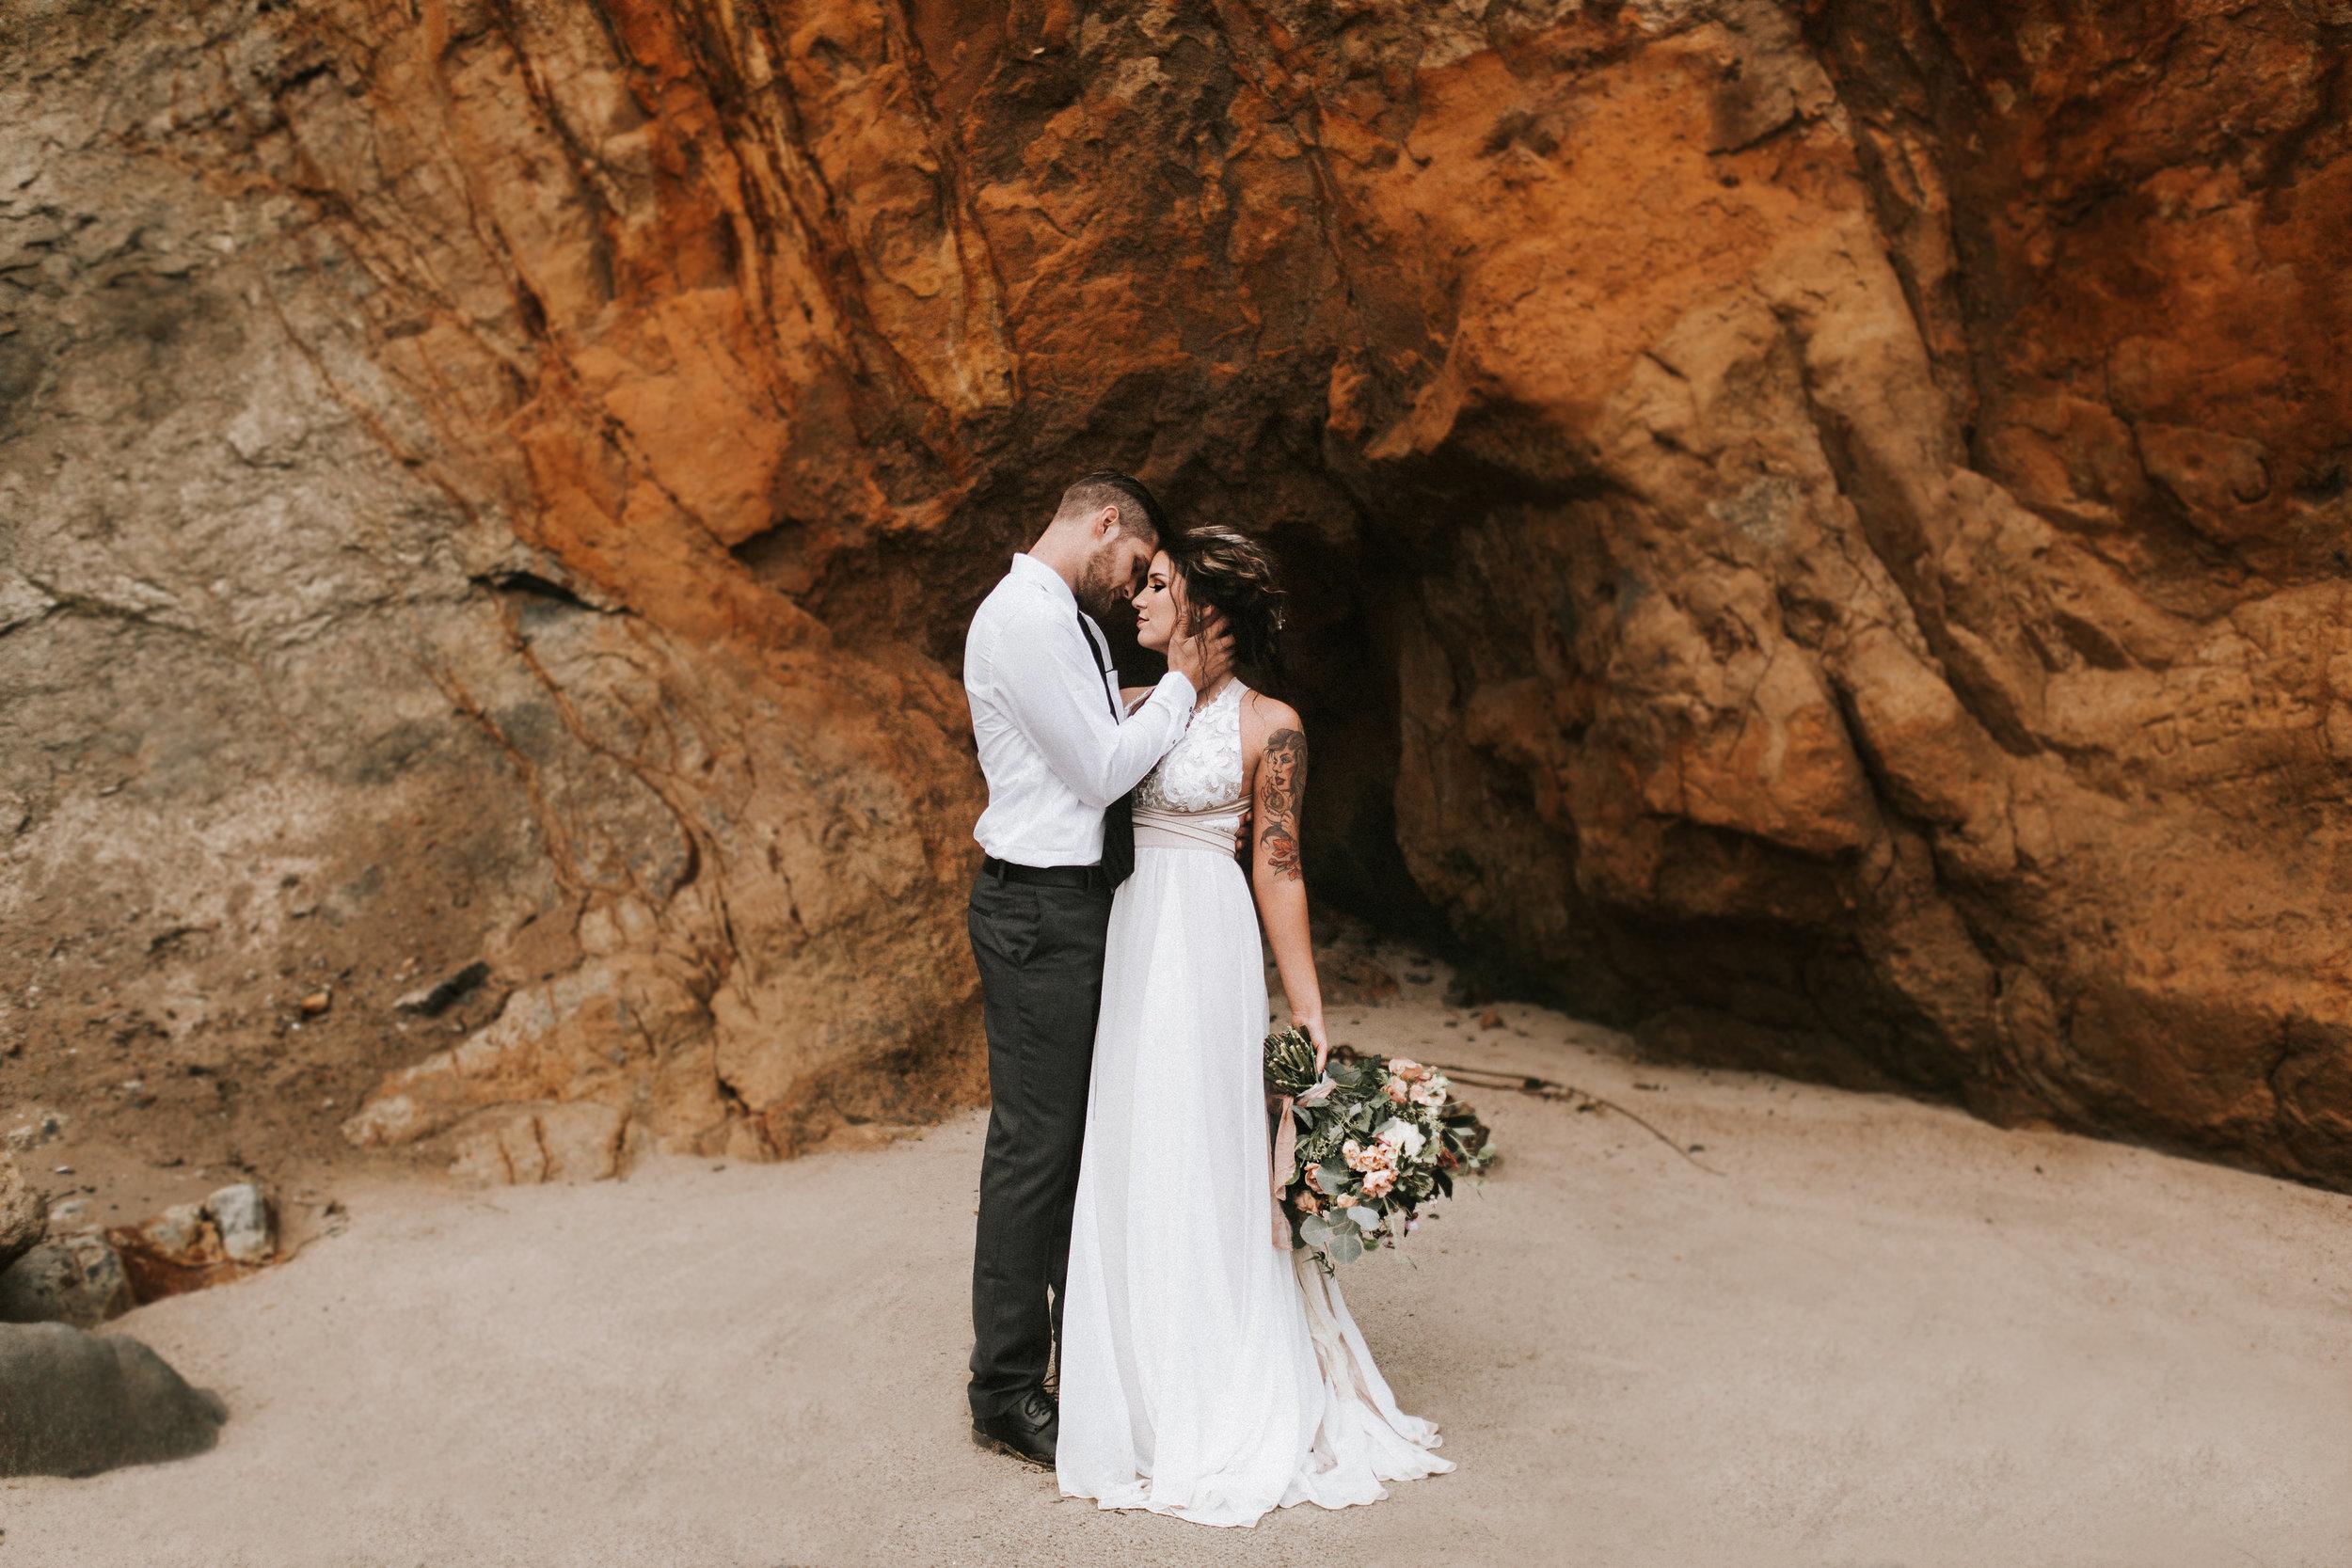 wedding kiss on the rocks